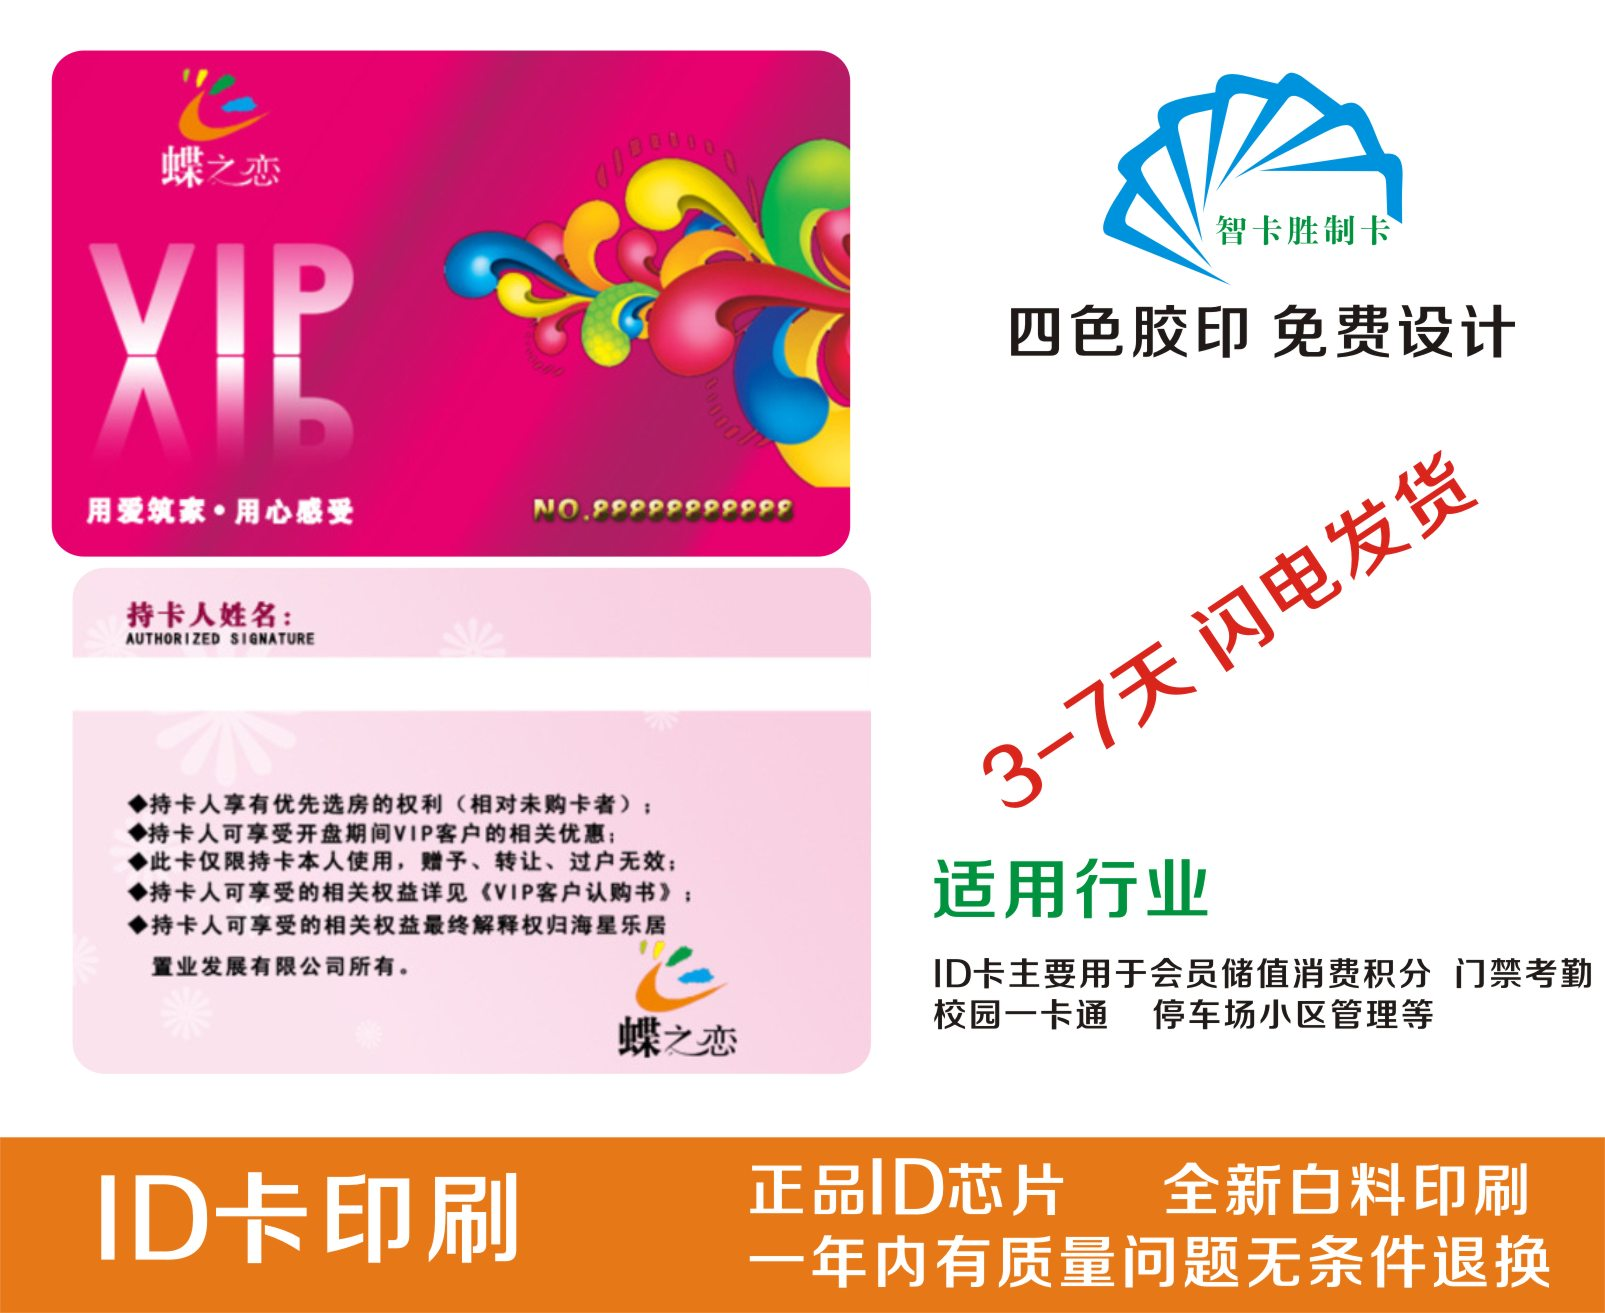 ID印刷卡 门禁ID卡 考勤卡 感应饭卡 低频感应卡特价促销正品出售